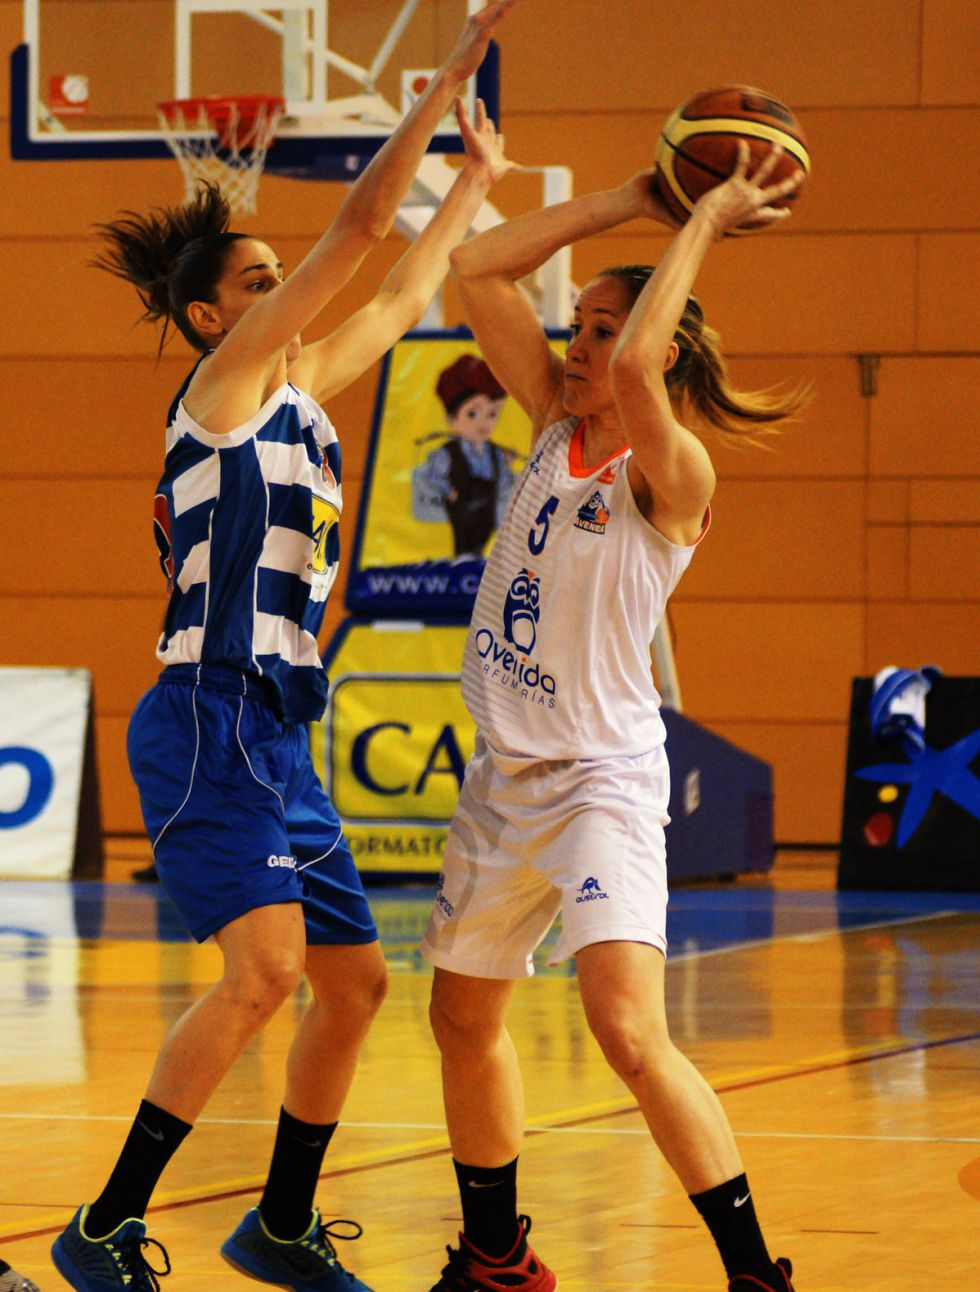 Liga Femenina Basket 2015 1428524957_385528_1428526289_noticia_grande